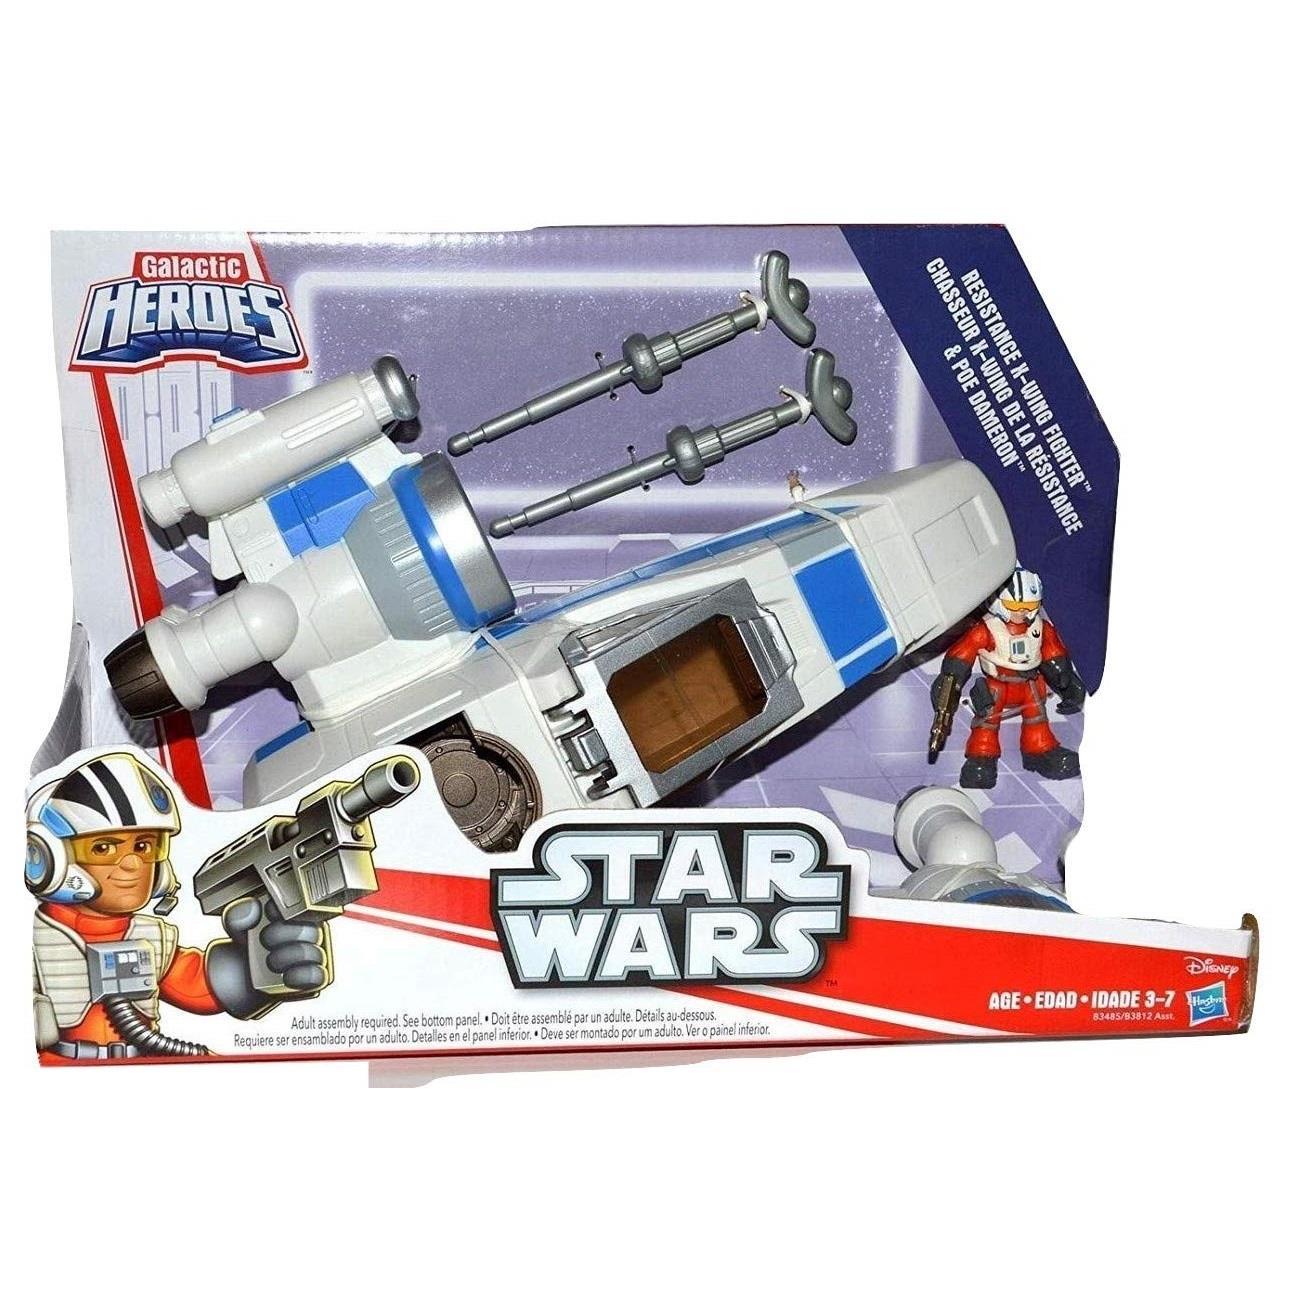 Playskool Star Wars Galactic Heroes Last Jedi Pilot X wing Poe Dameron